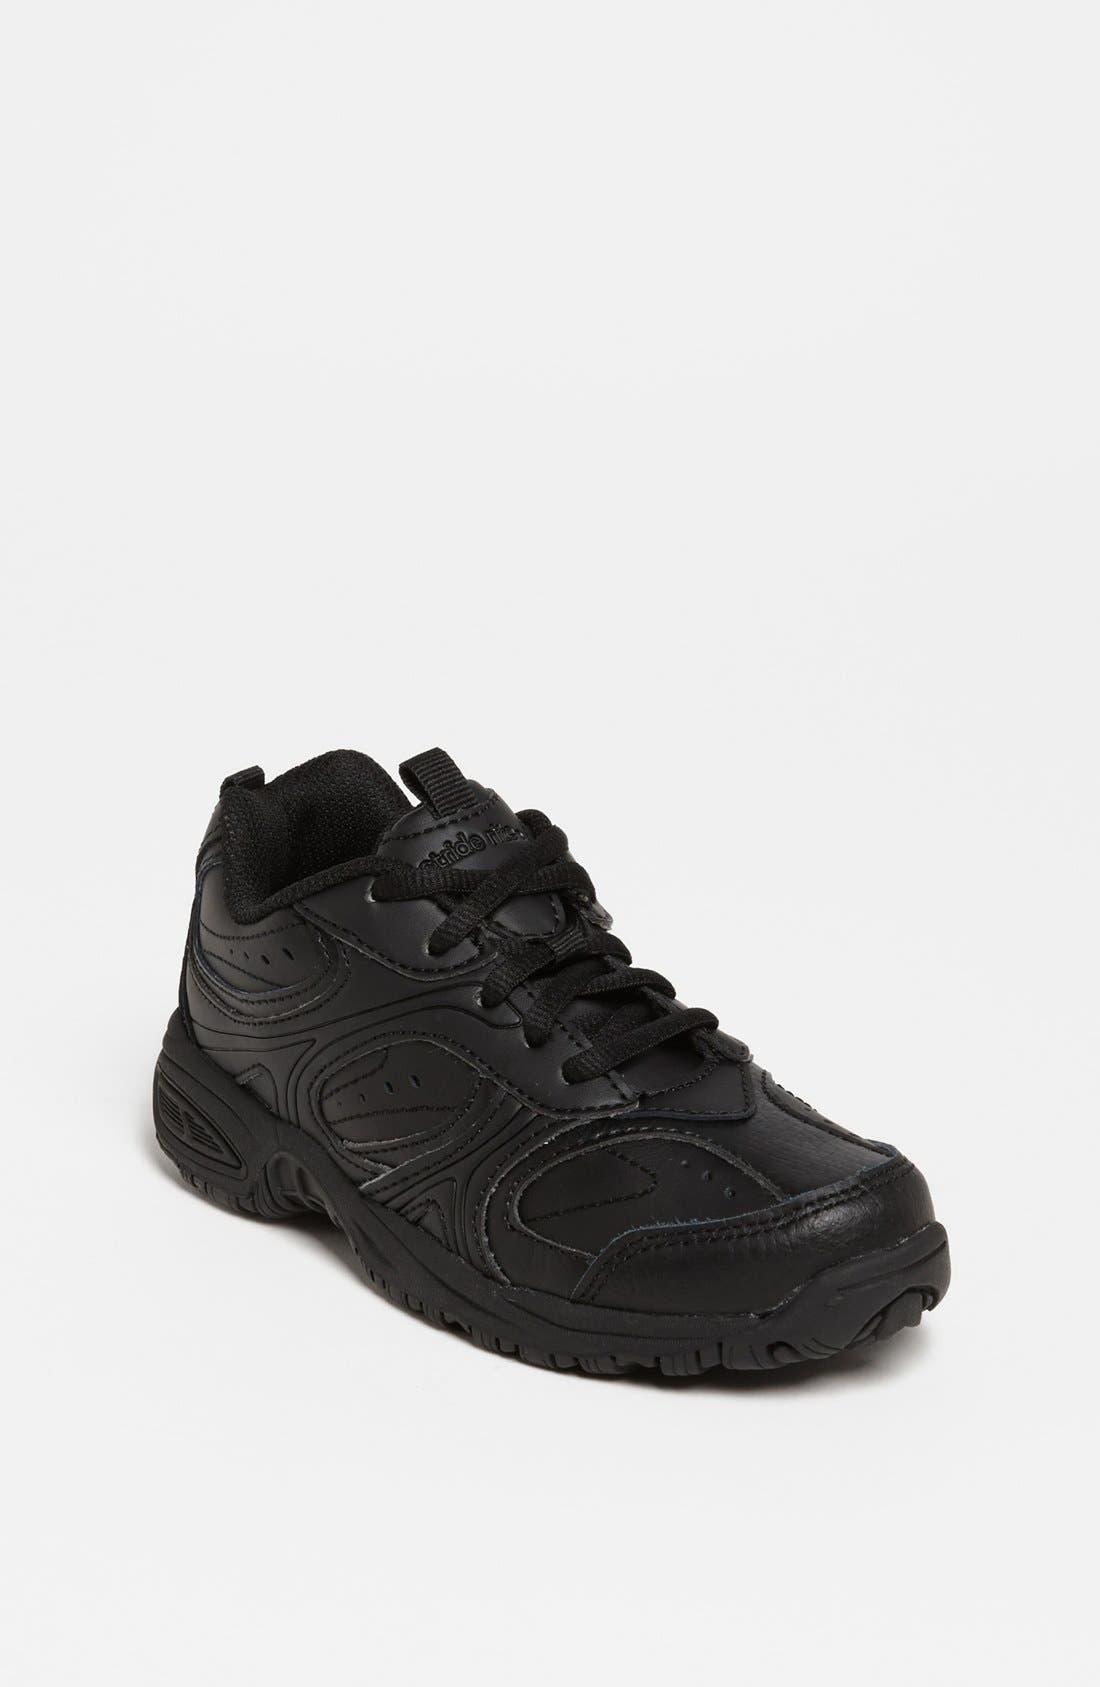 Main Image - Stride Rite 'Cooper' Sneaker (Toddler, Little Kid & Big Kid)